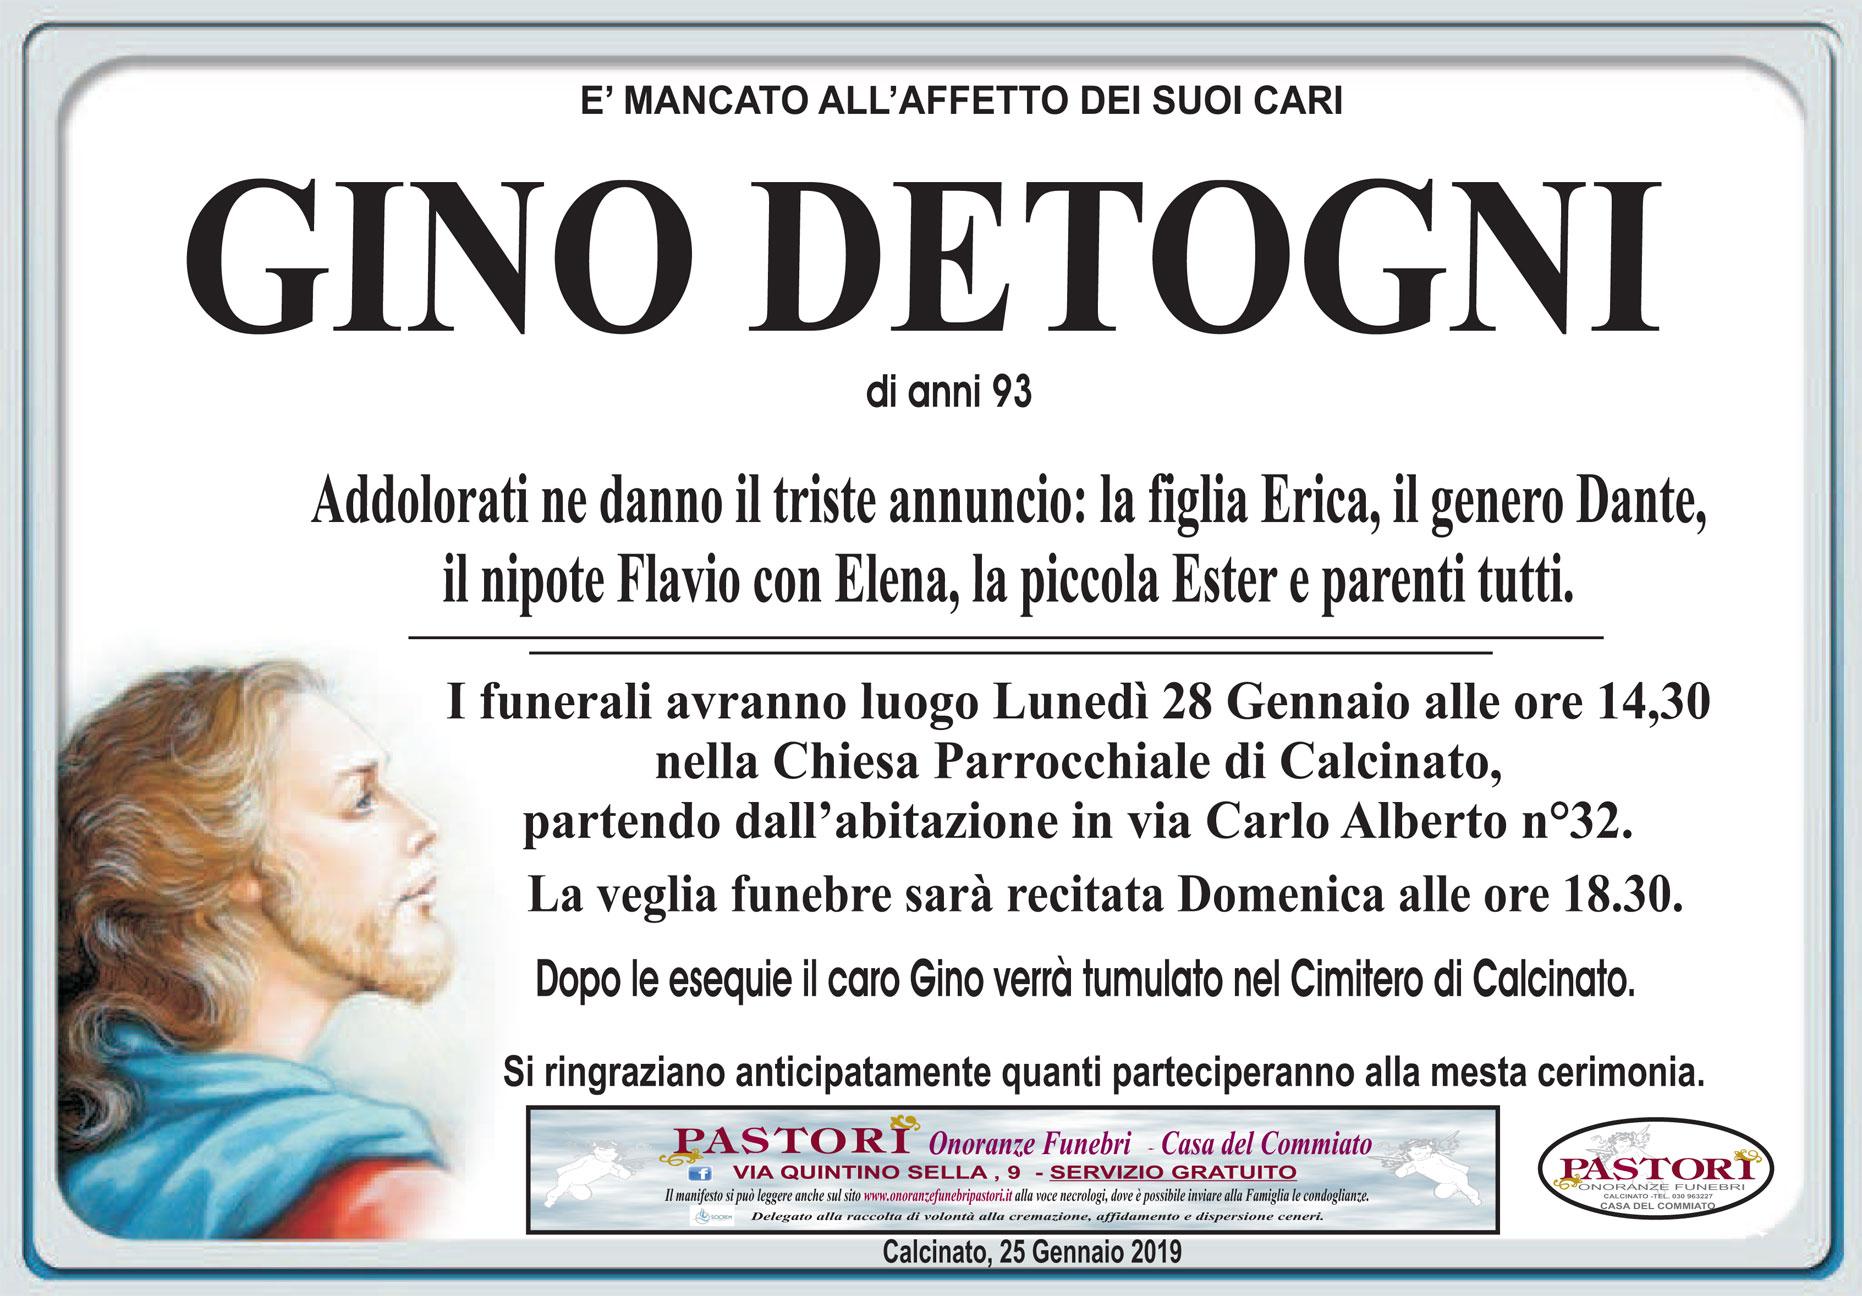 Gino Detogni